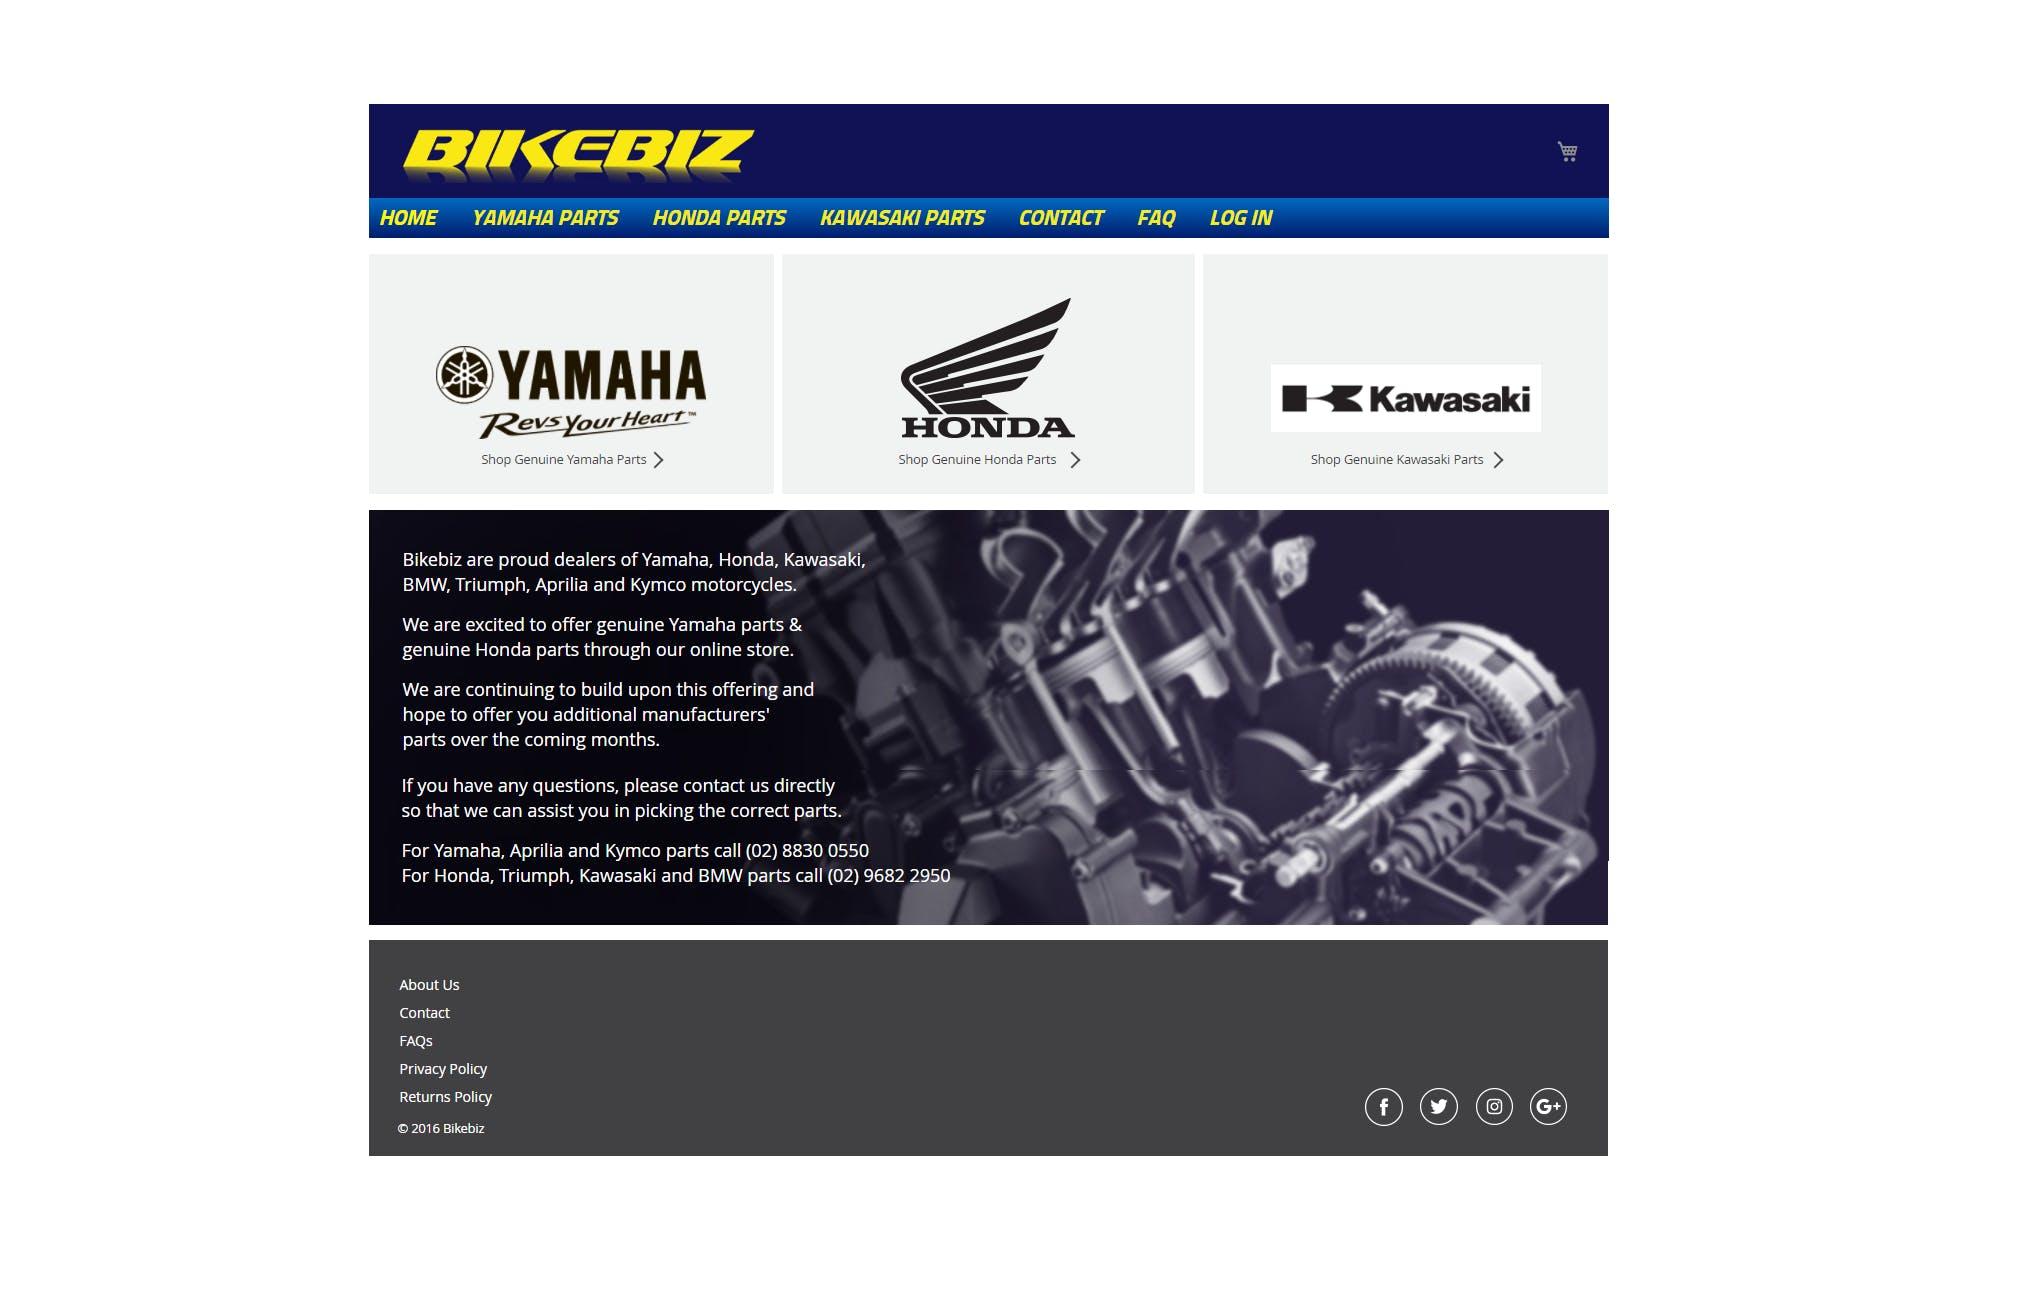 A screen shot of The Bikebiz Genuine Spare Parts Website